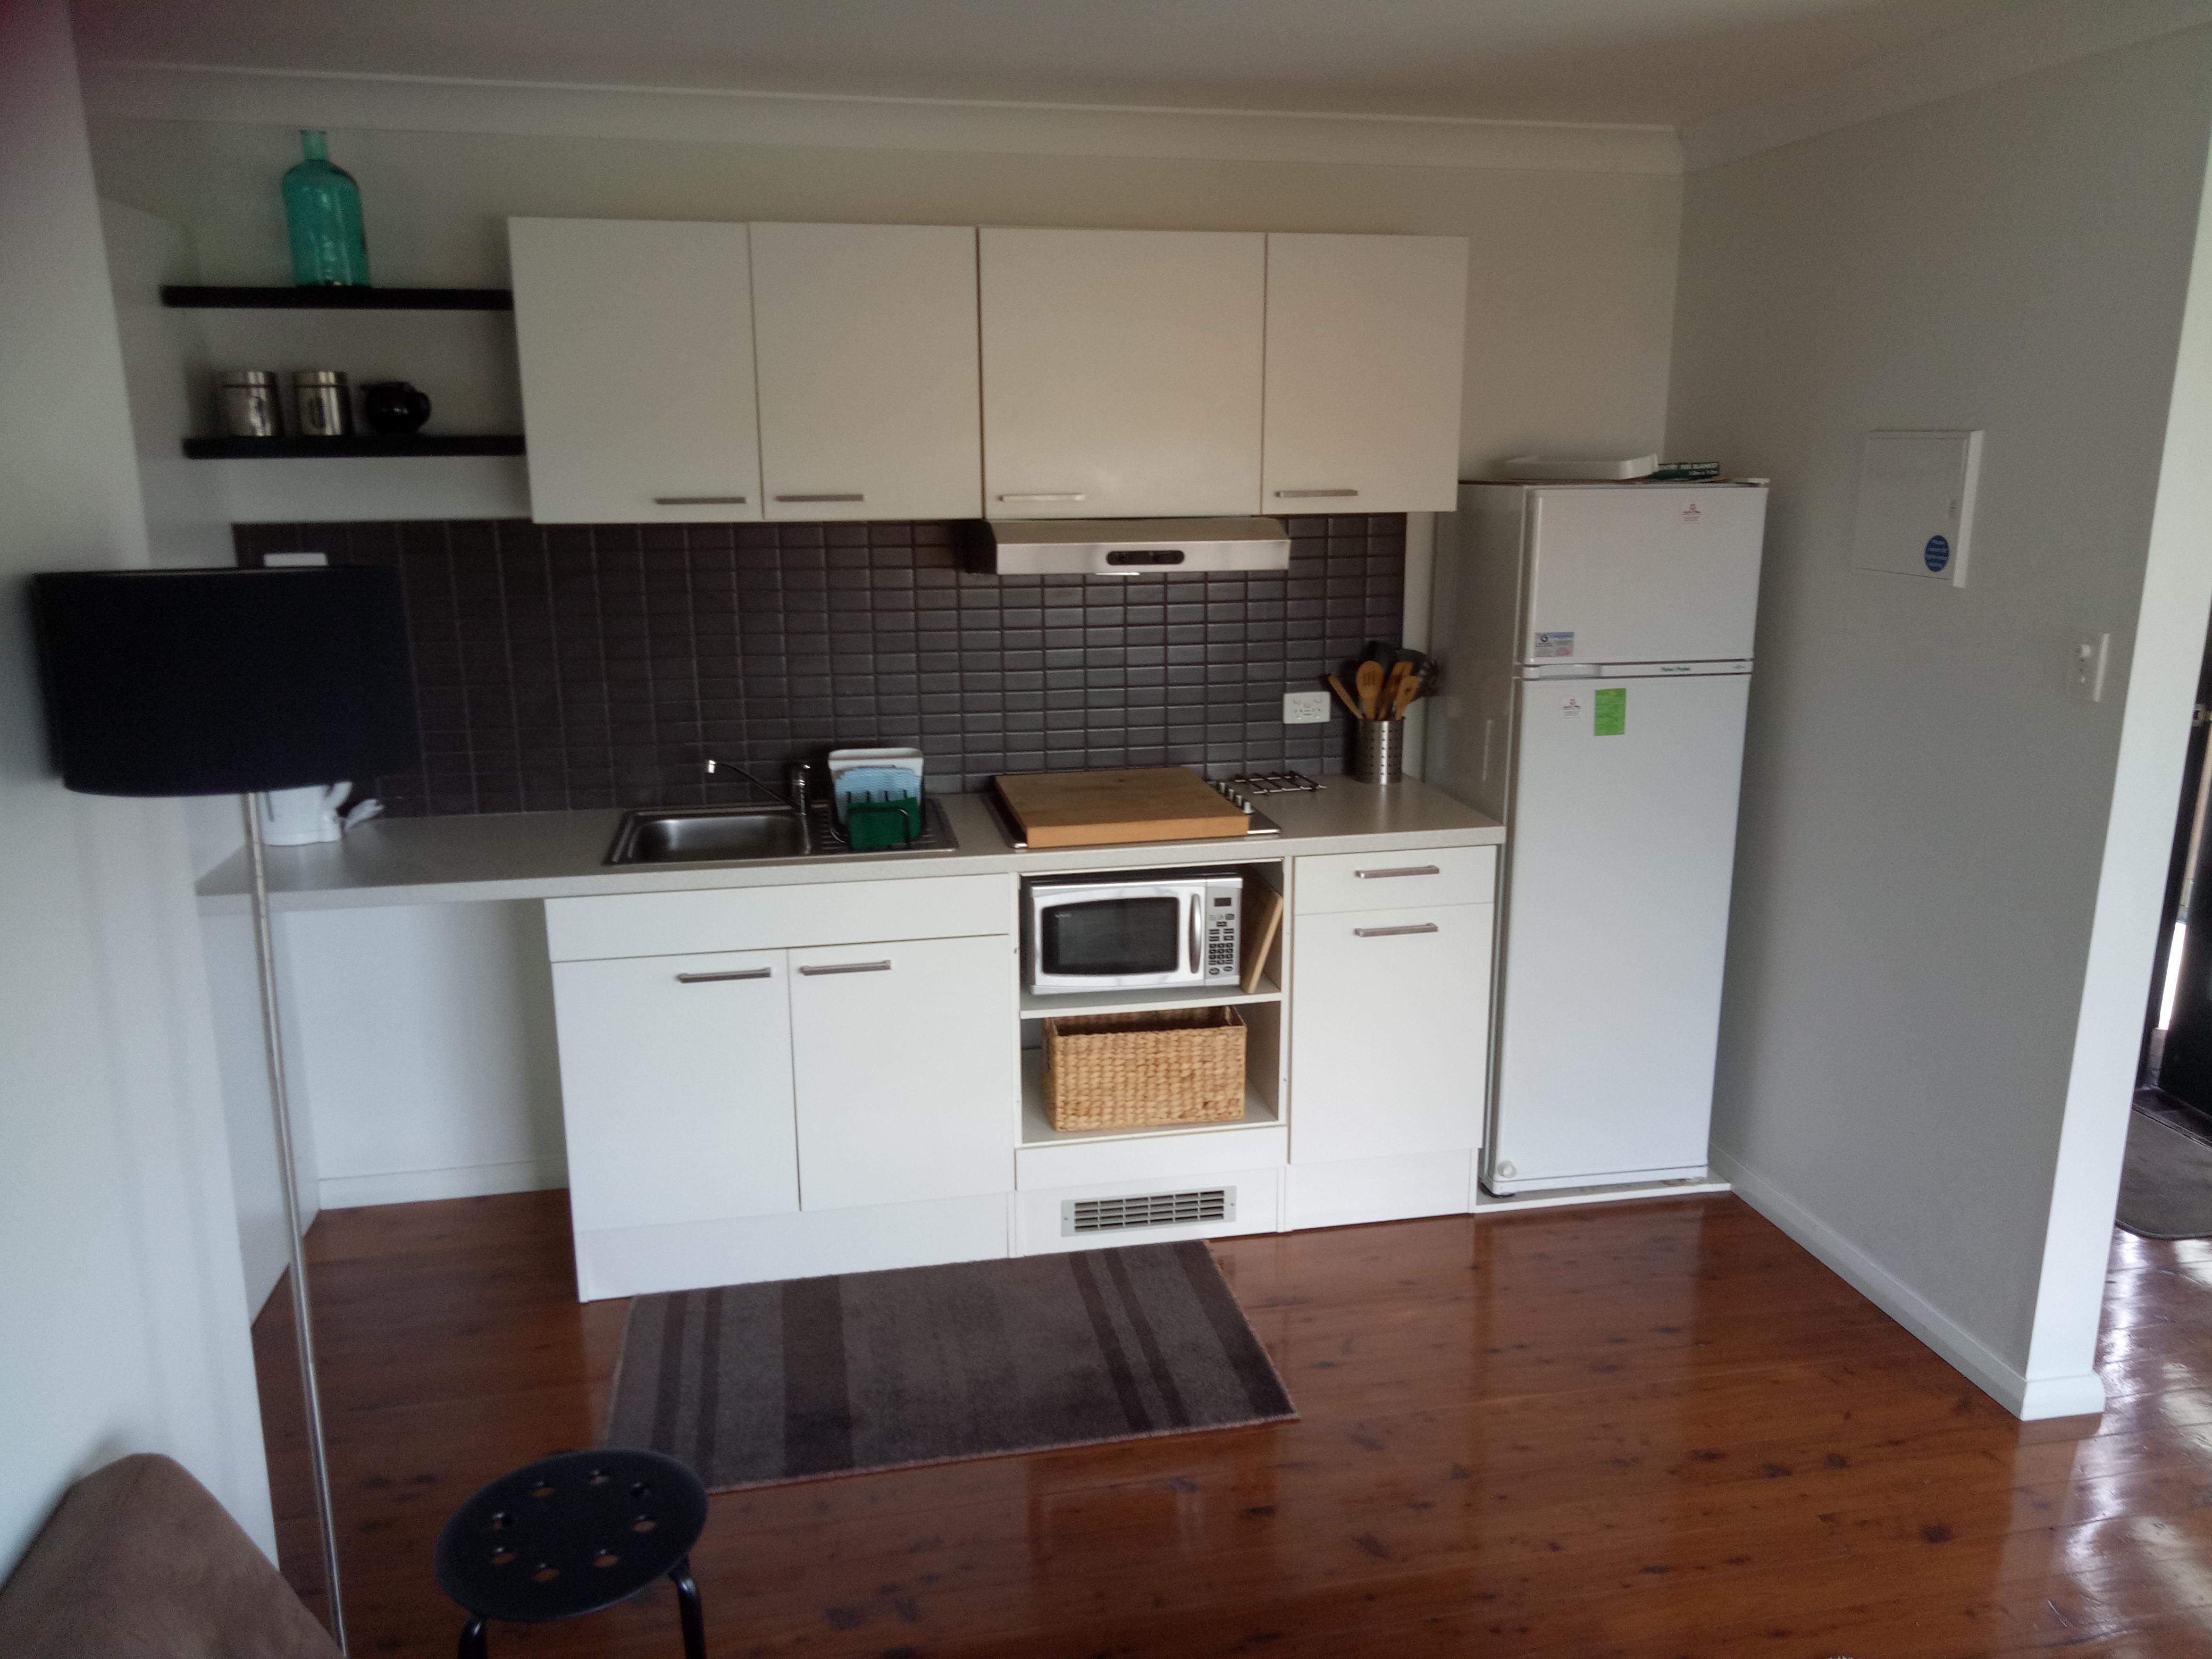 Gallery Kitchen ( No oven)